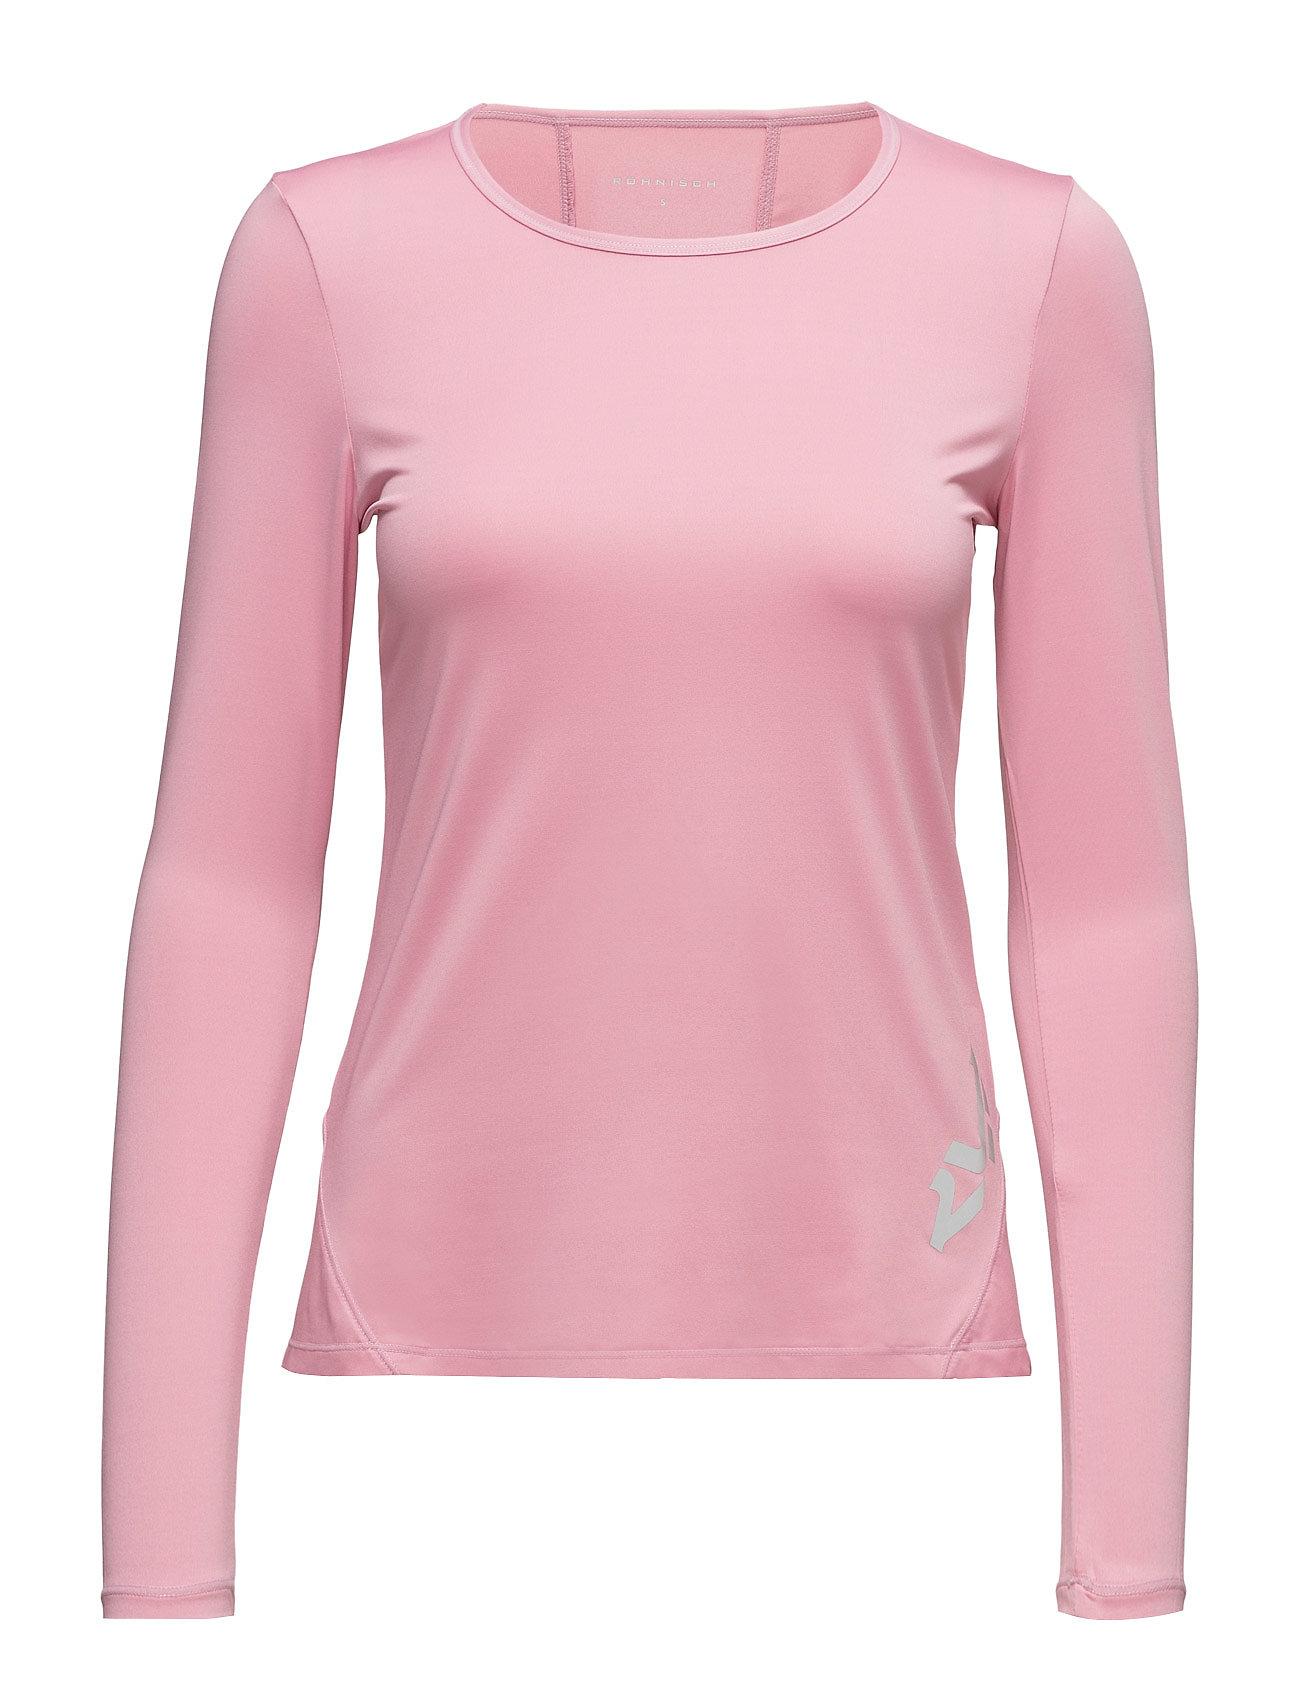 Genna Long Sleeve Rˆhnisch Sports toppe til Damer i